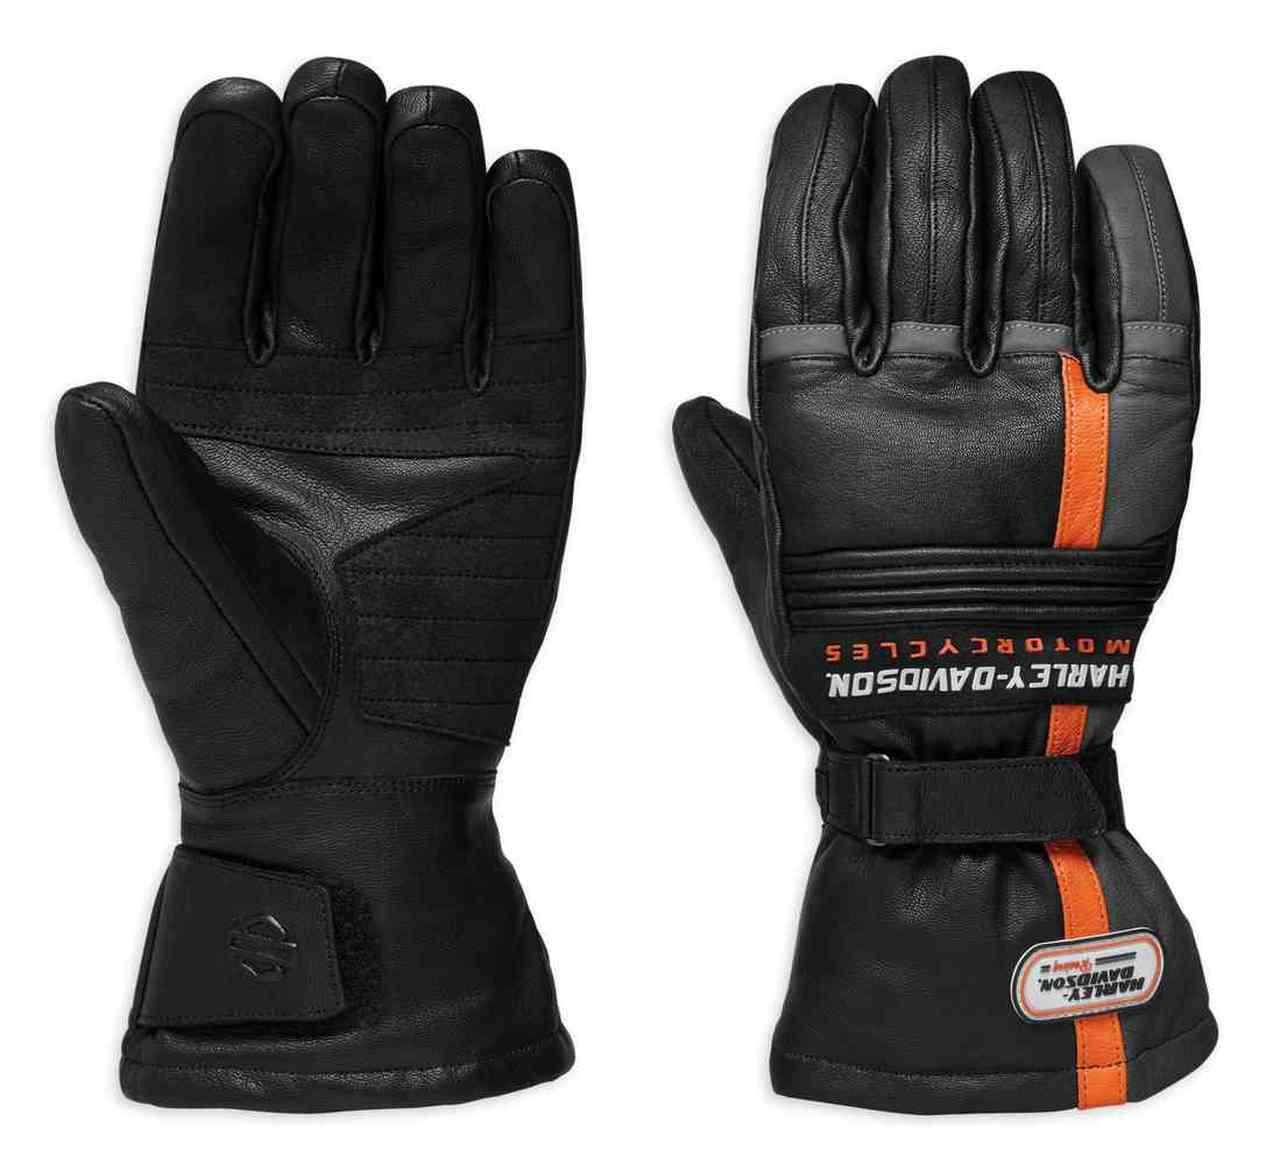 Harley-Davidson® Men's Ratchett Gauntlet Leather Gloves, Black